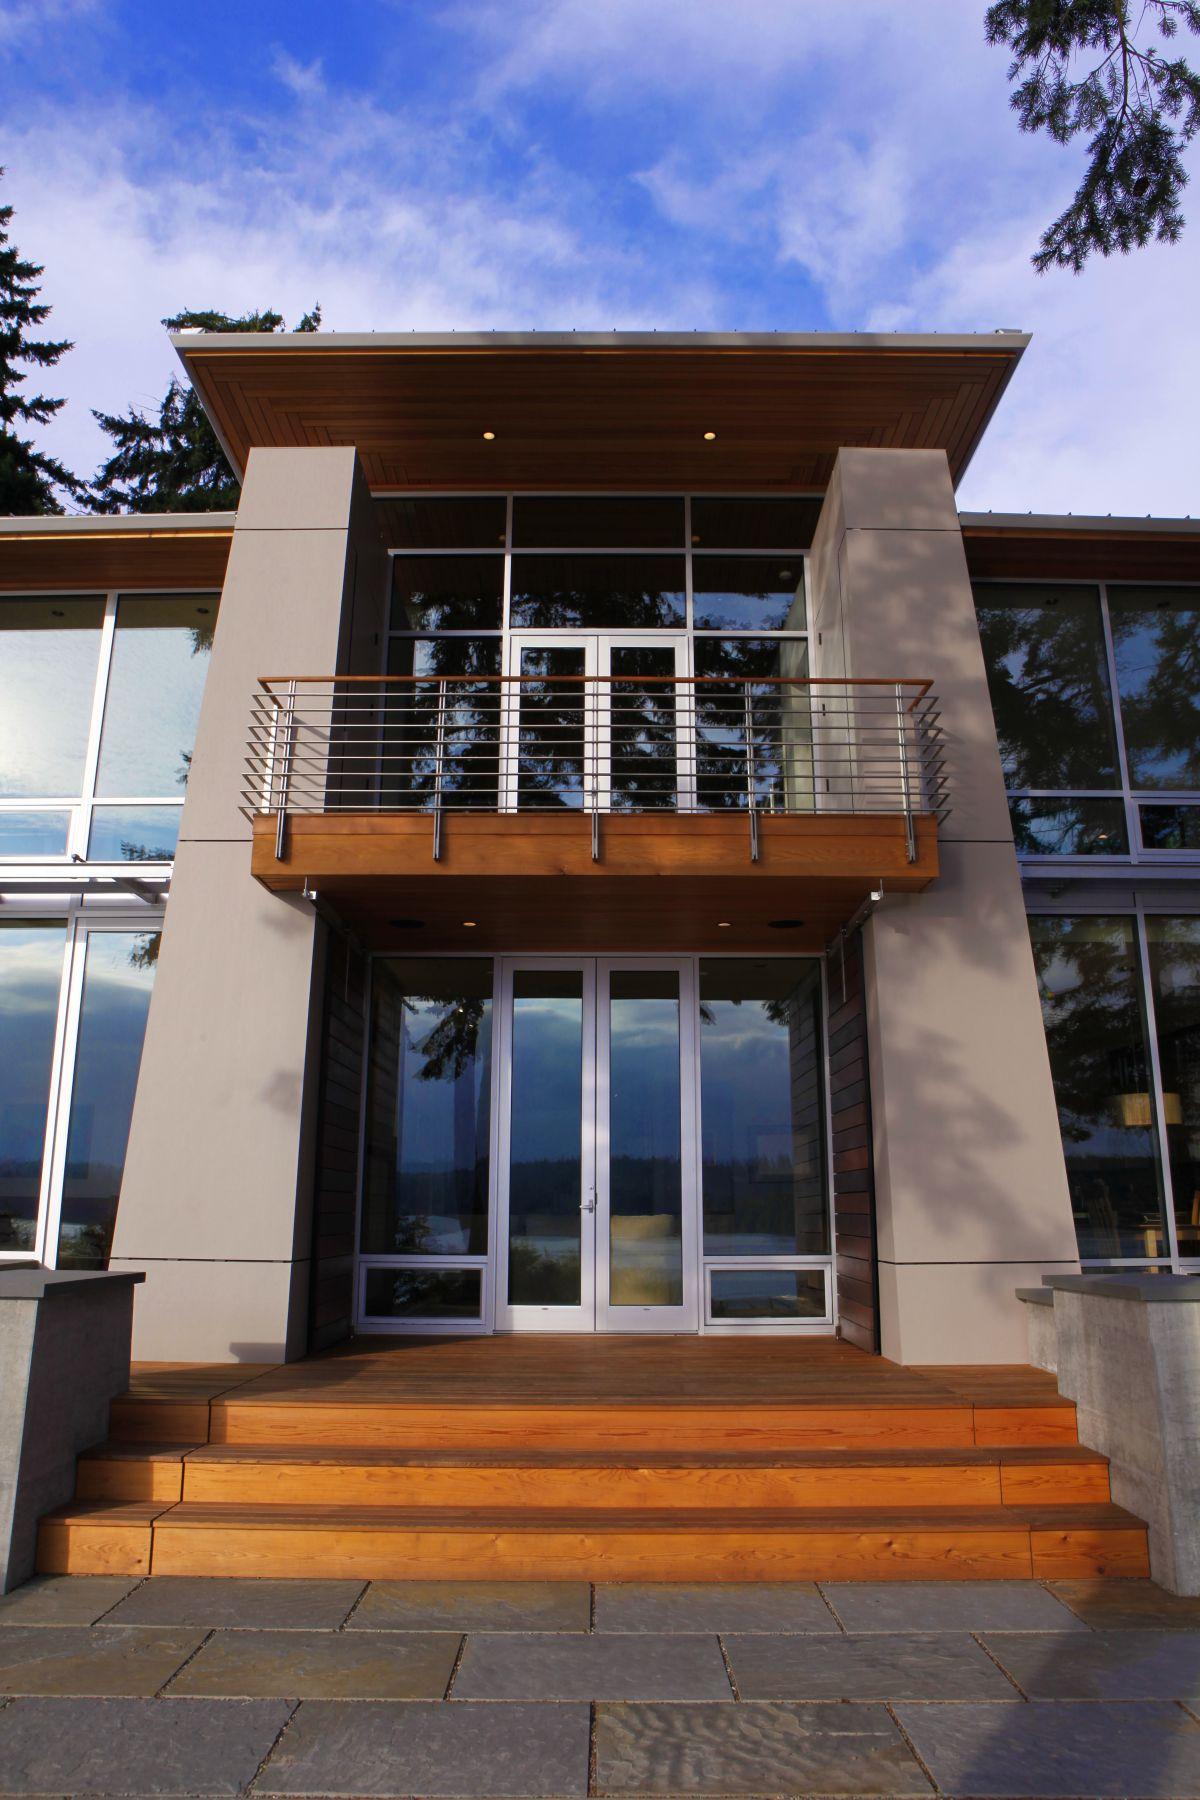 Front Door, Entrance, Olympic View House on Bainbridge Island